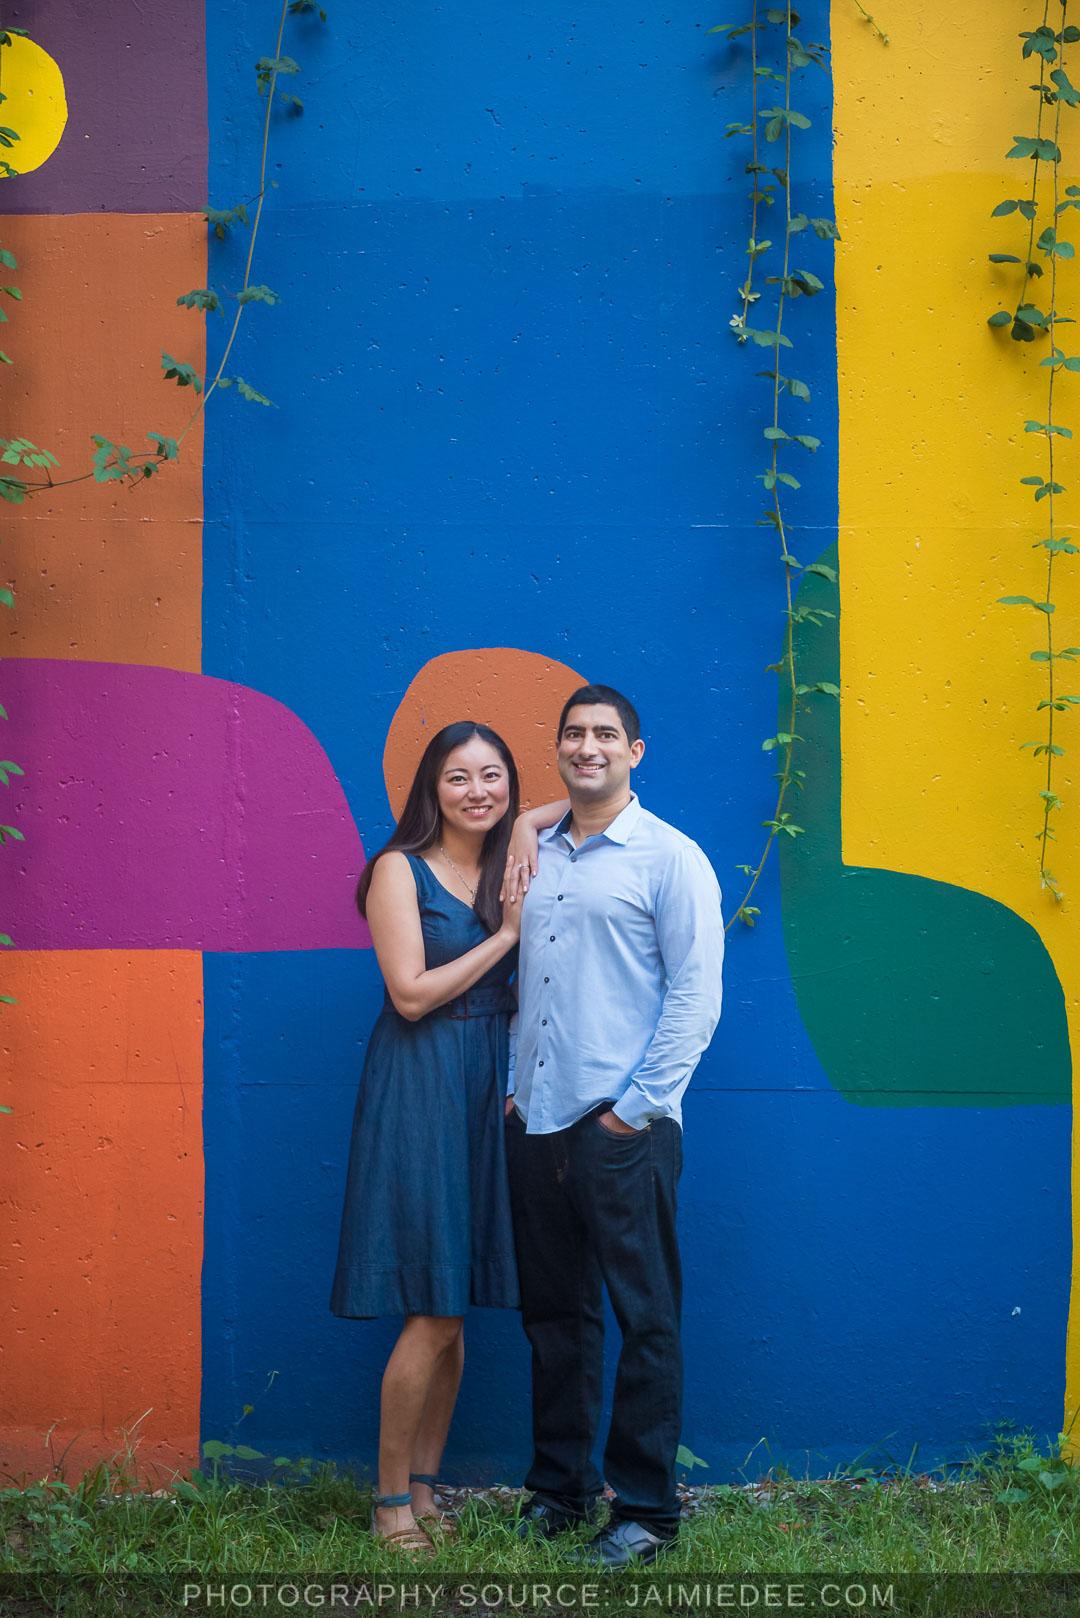 Atlanta-Beltline-engagement-photos-artwork